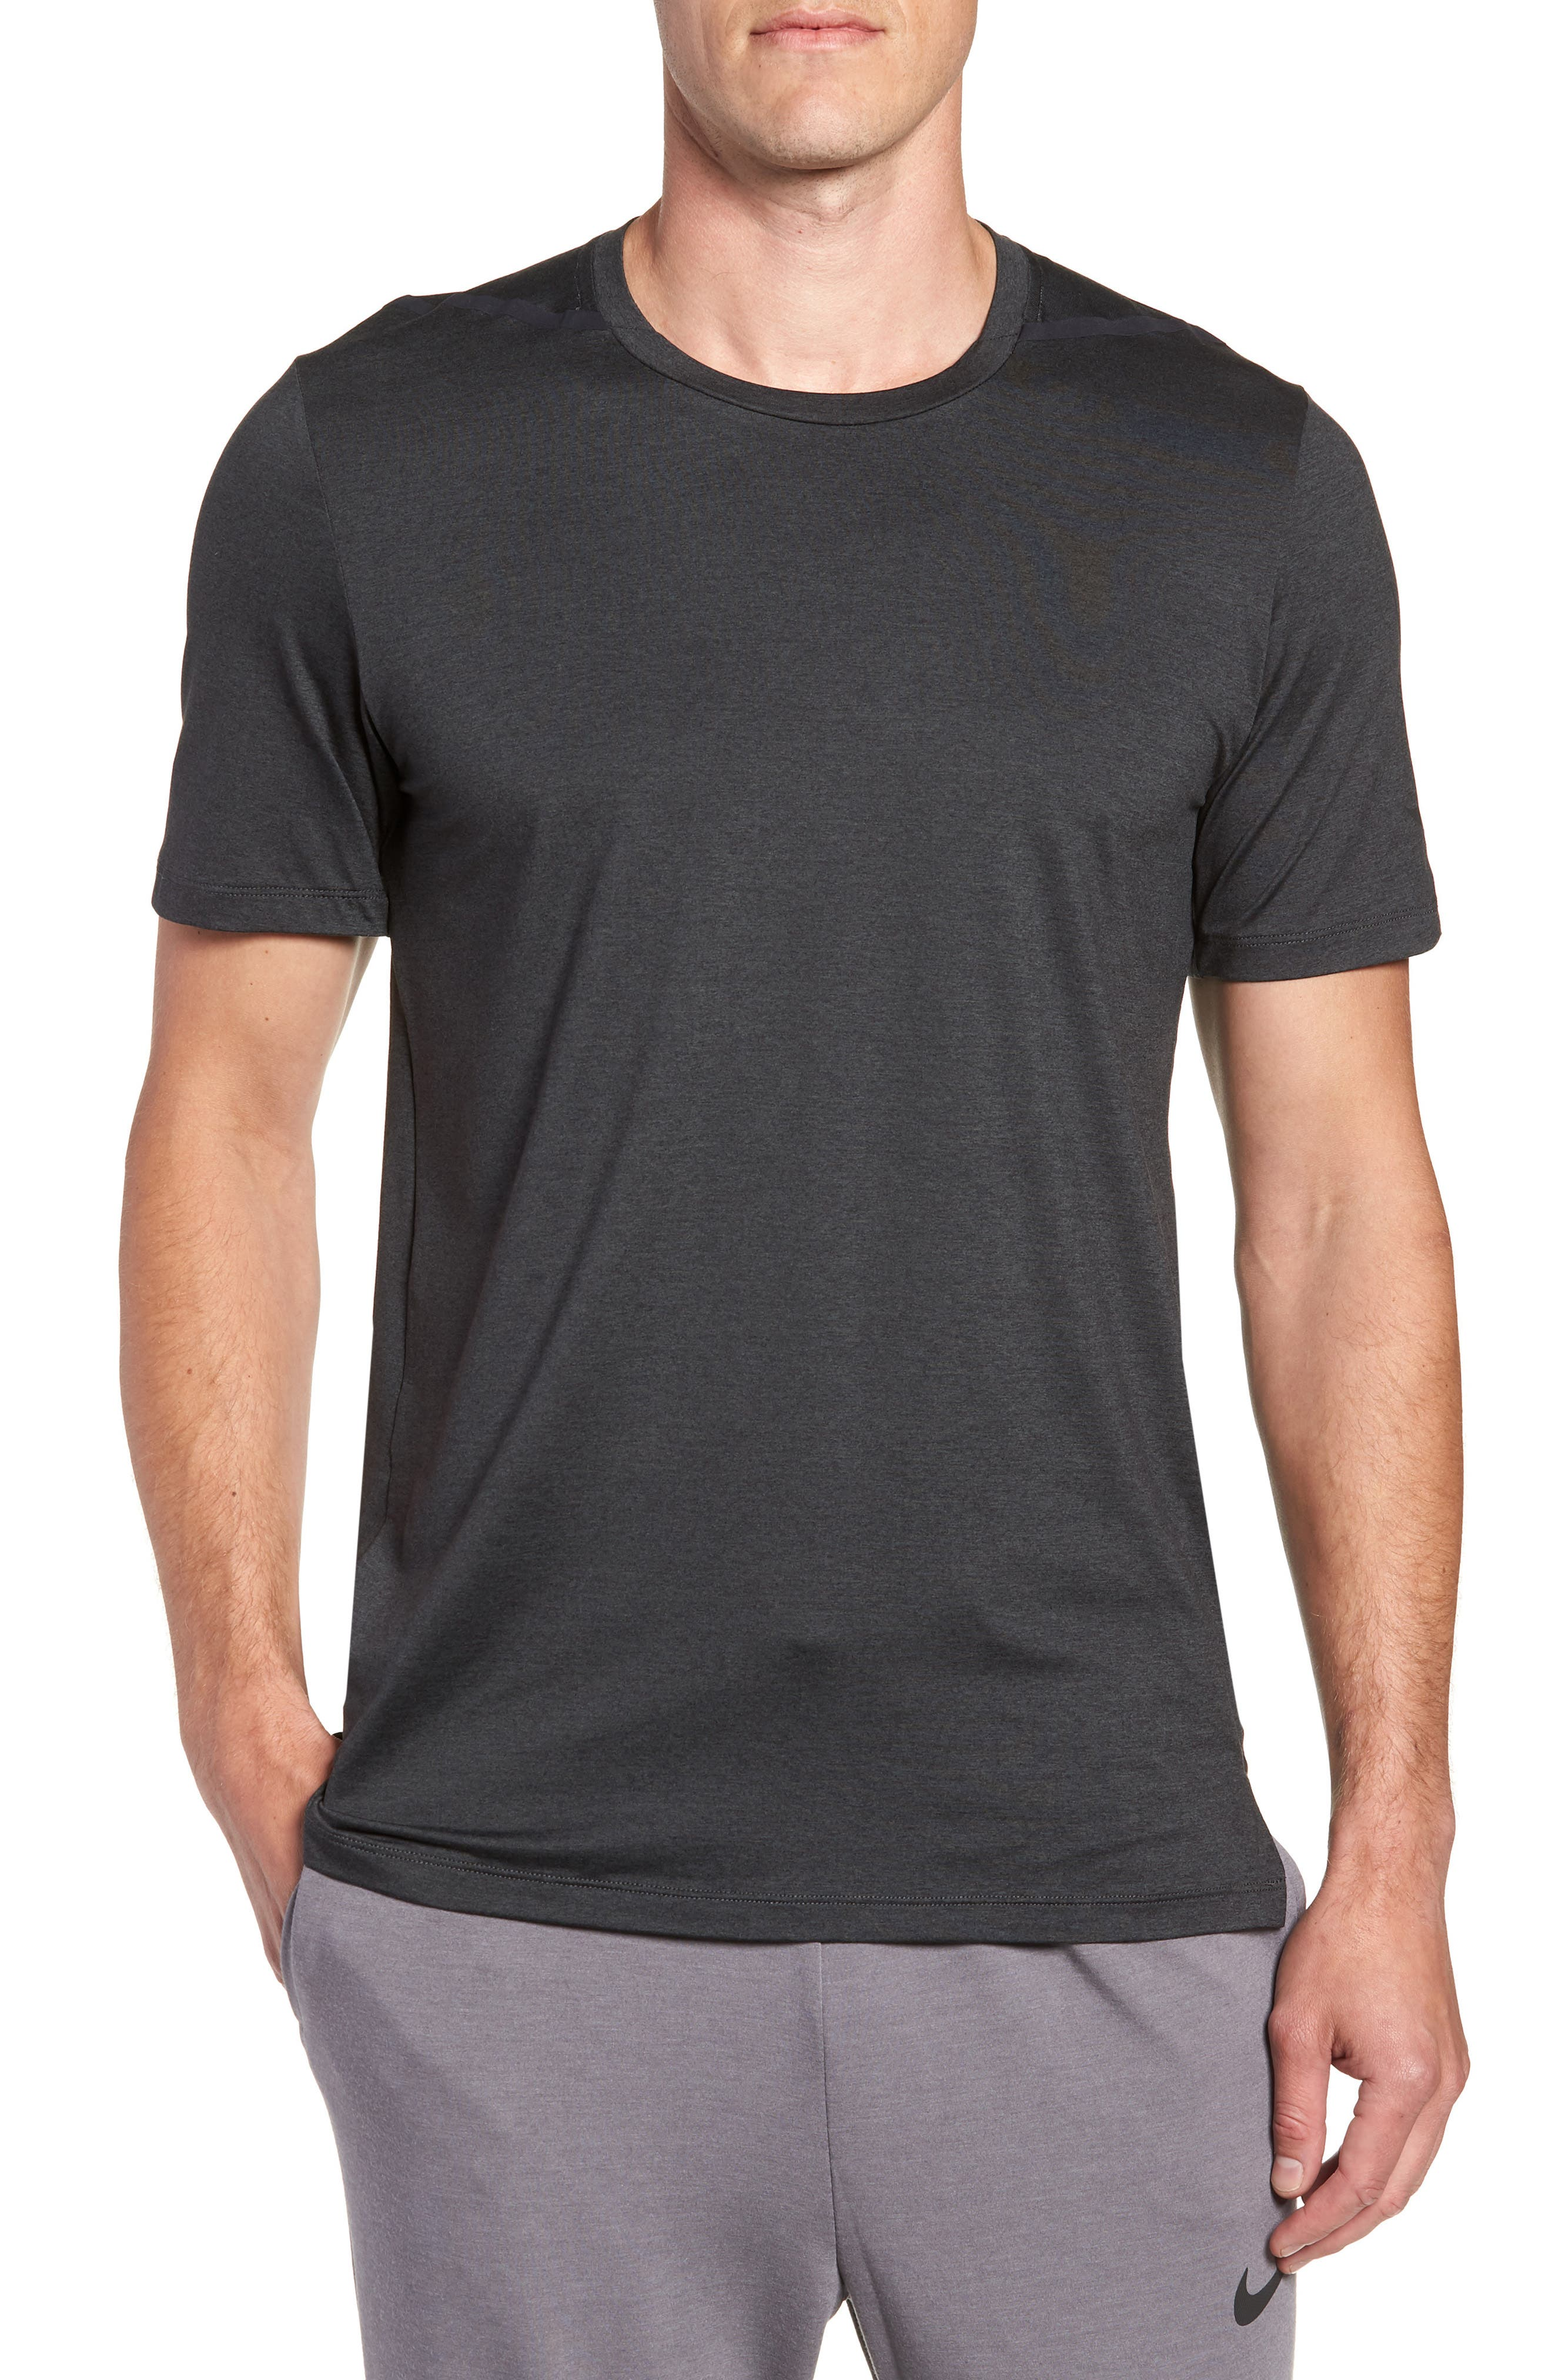 Dry Max Training T-Shirt,                         Main,                         color, BLACK/ ANTHRACITE/ COBALT